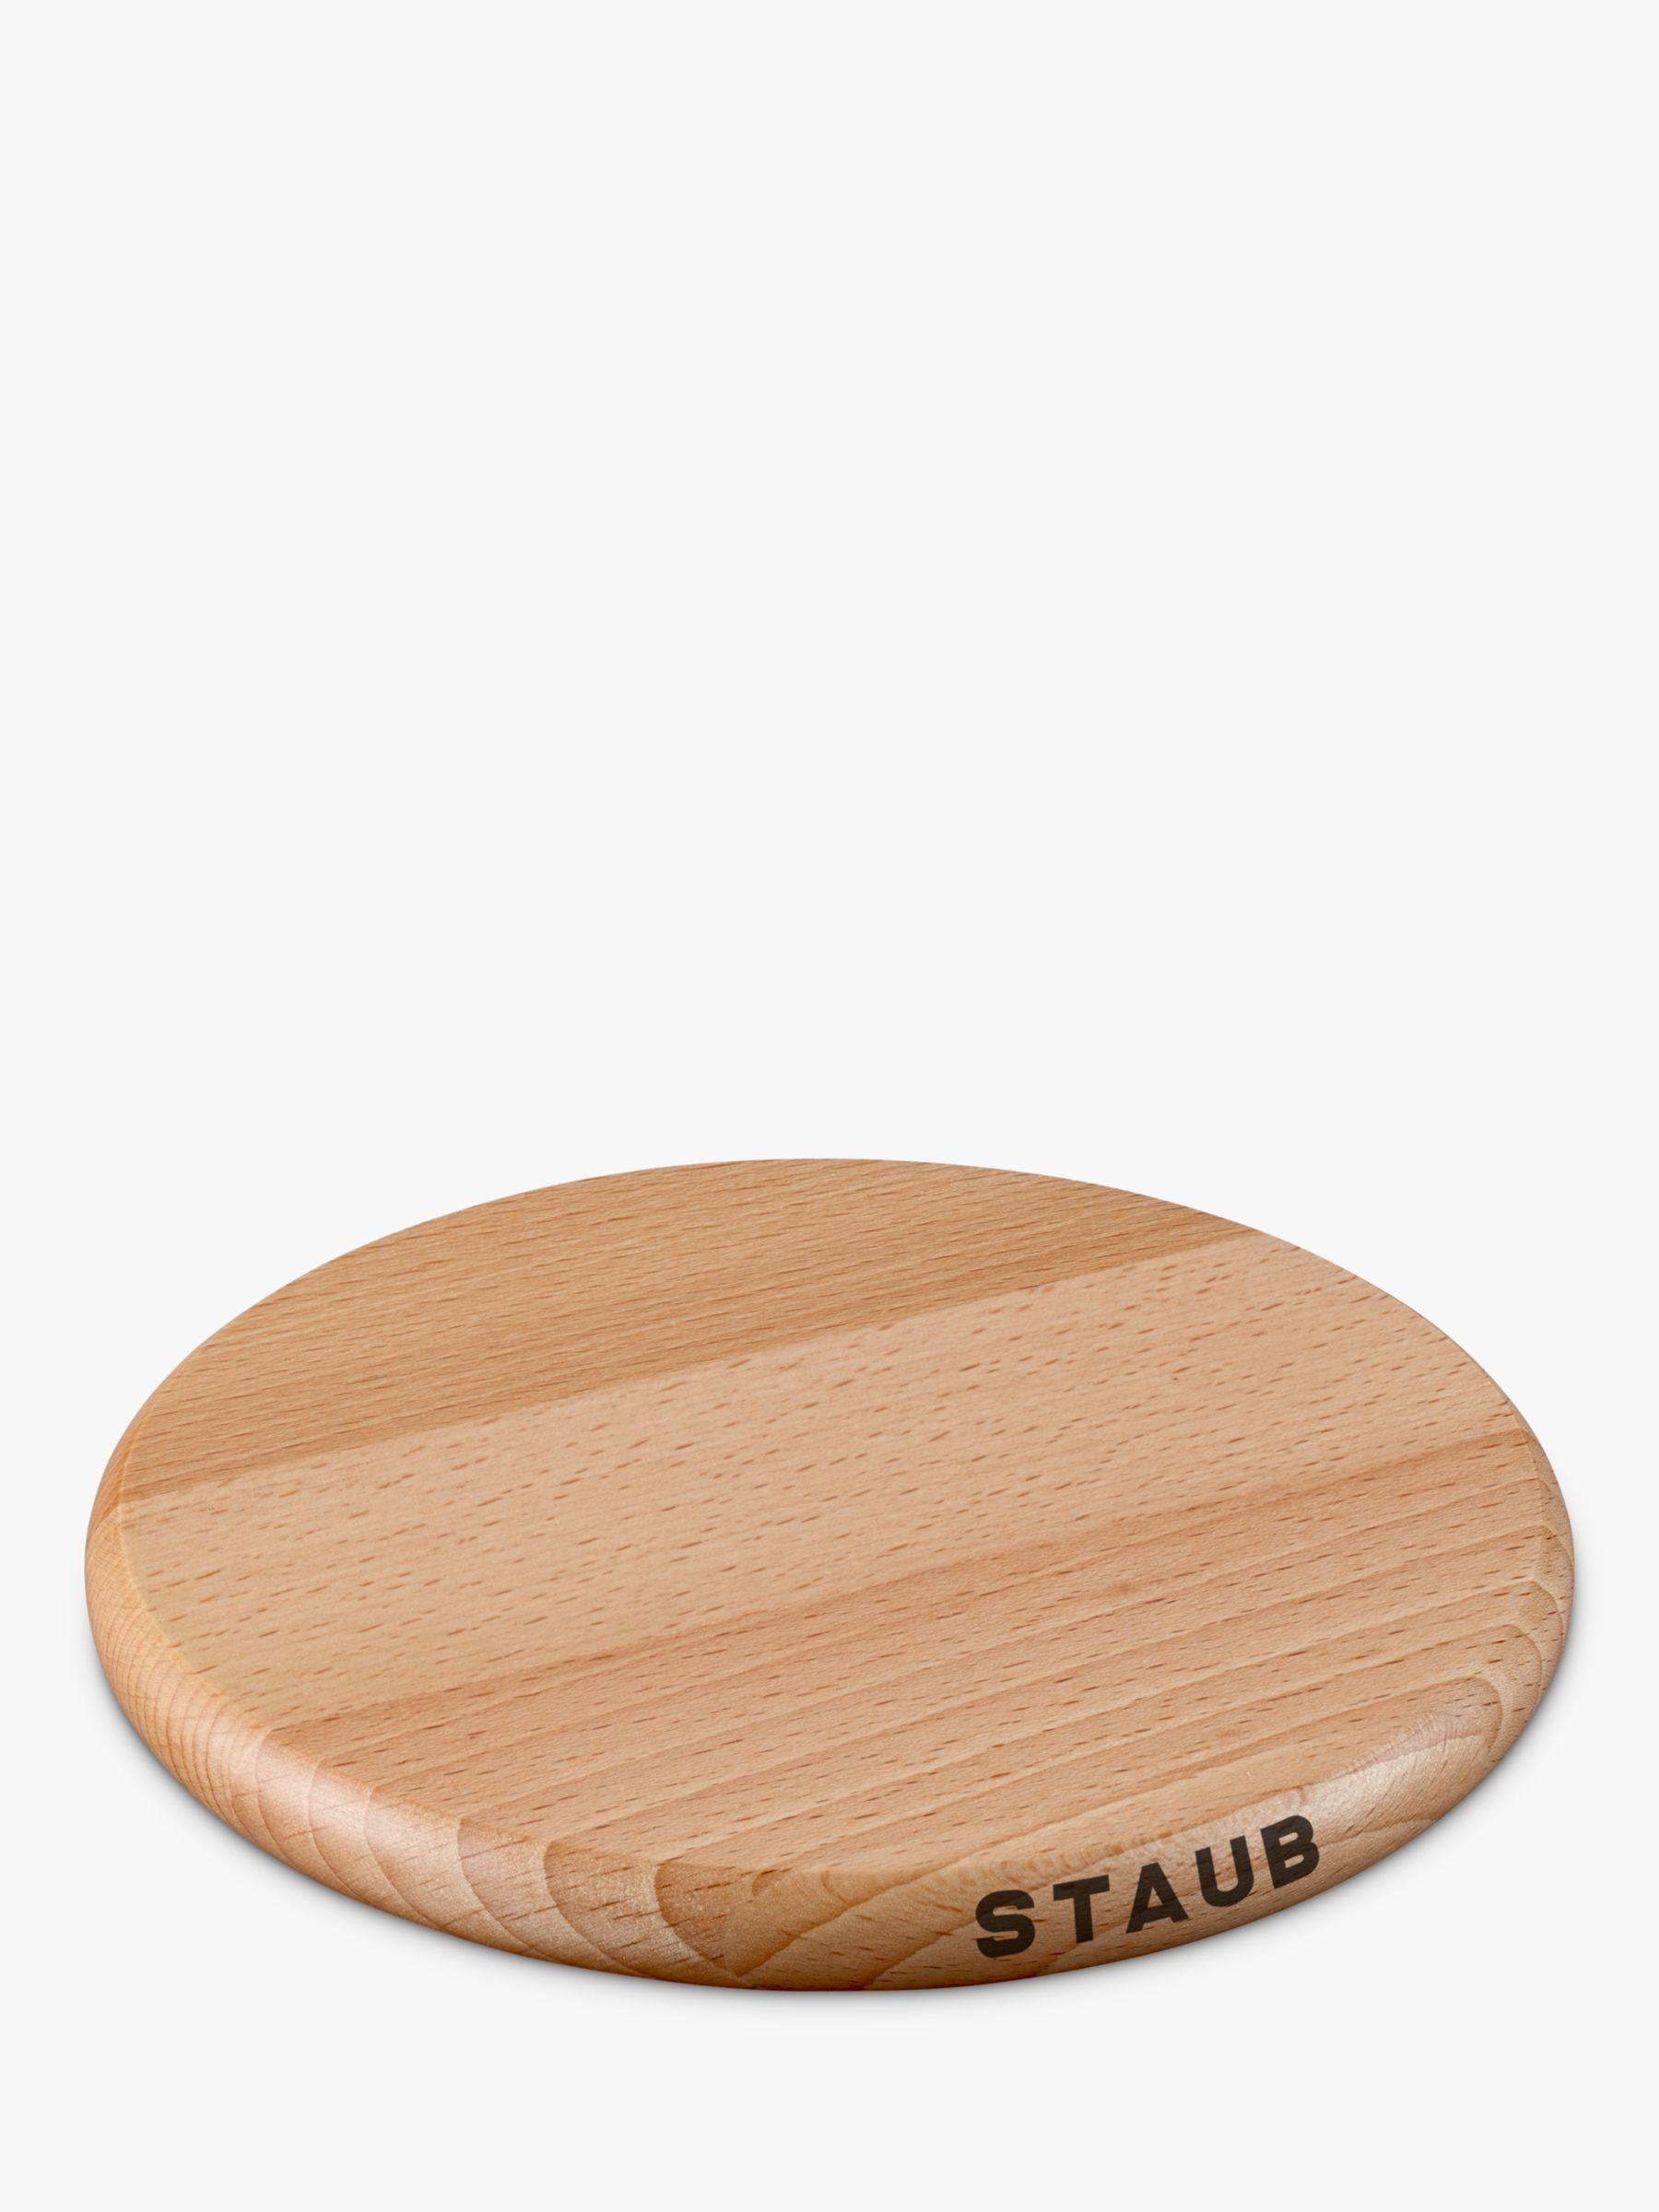 Staub Round Magnetic Wooden Trivet Natural At John Lewis Partners